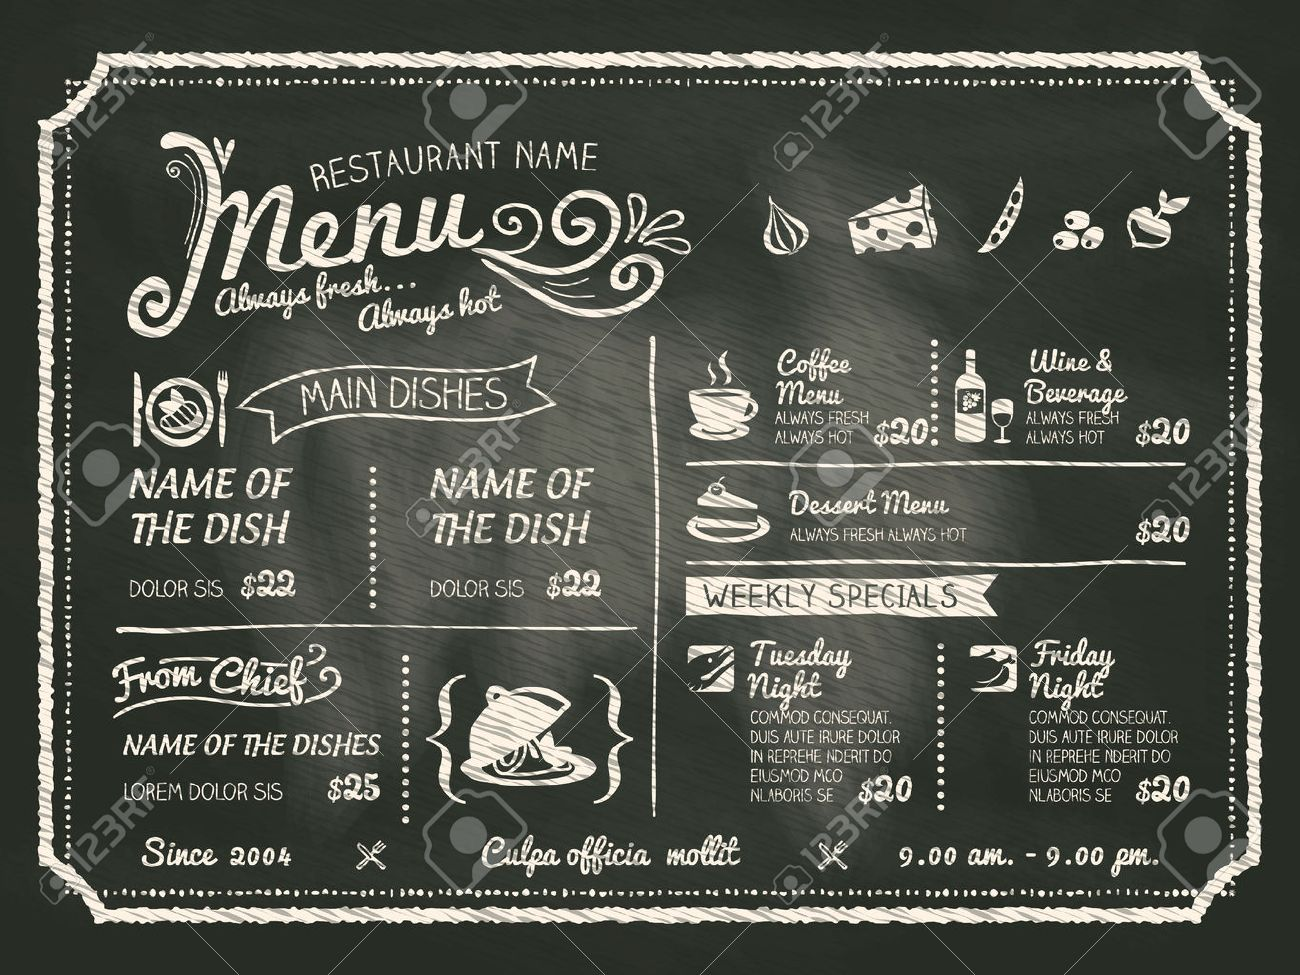 Restaurant Food Menu Design with Chalkboard Background - 29385396